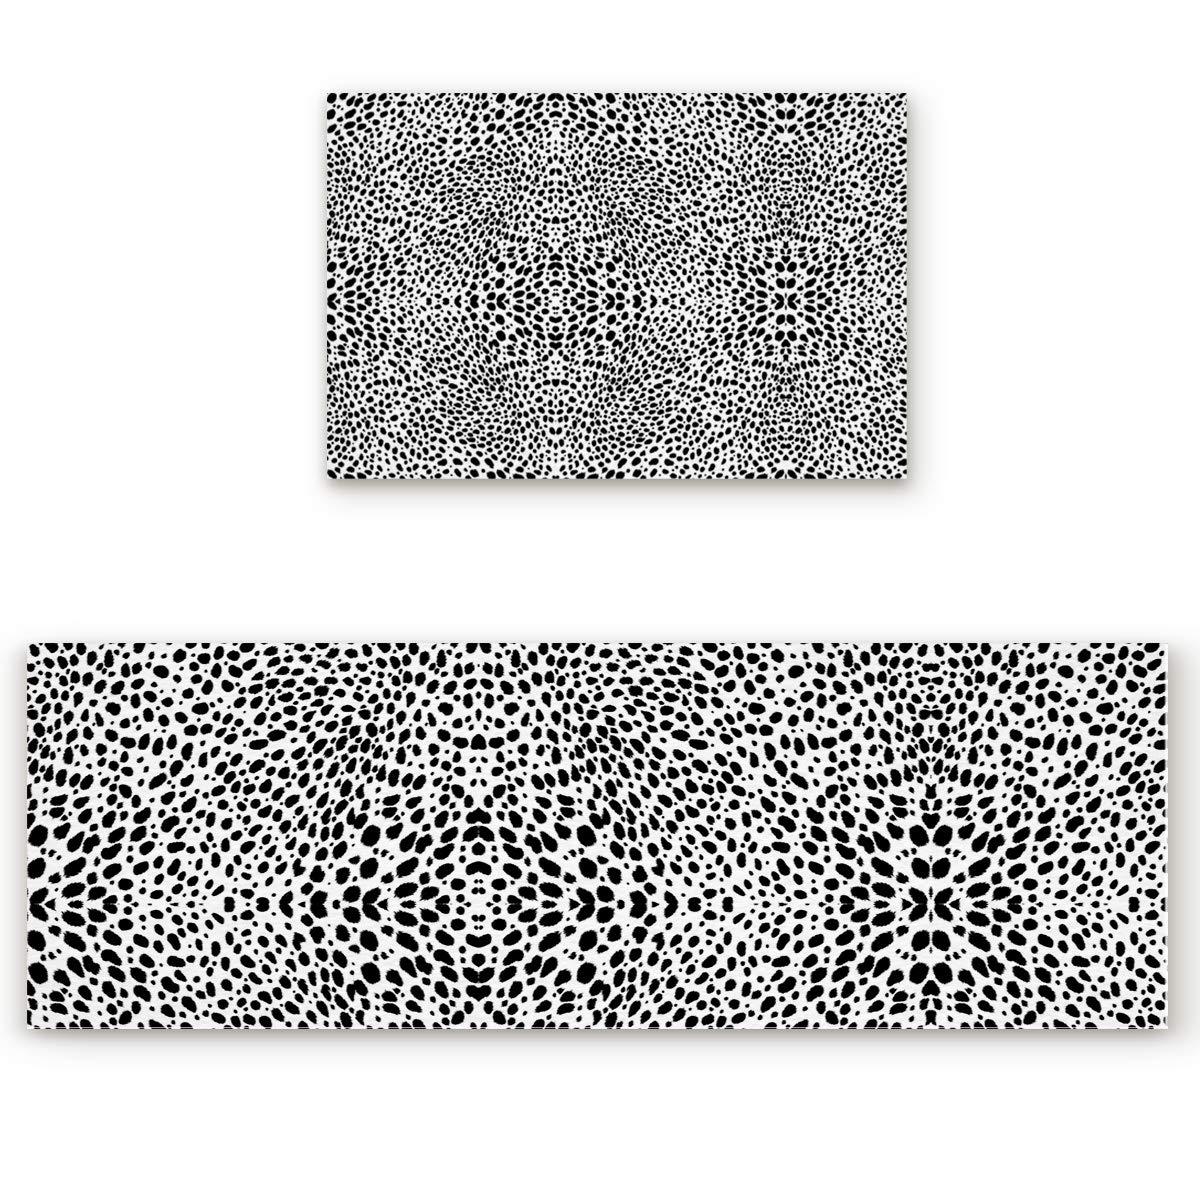 23.6\ SODIKA 2 Pieces Kitchen Rug Set,Non-Skid Slip Washable Doormat Floor Runner Bathroom Area Rug Carpet,Animal Leopard Print (23.6x35.4in+23.6x70.9 inches)